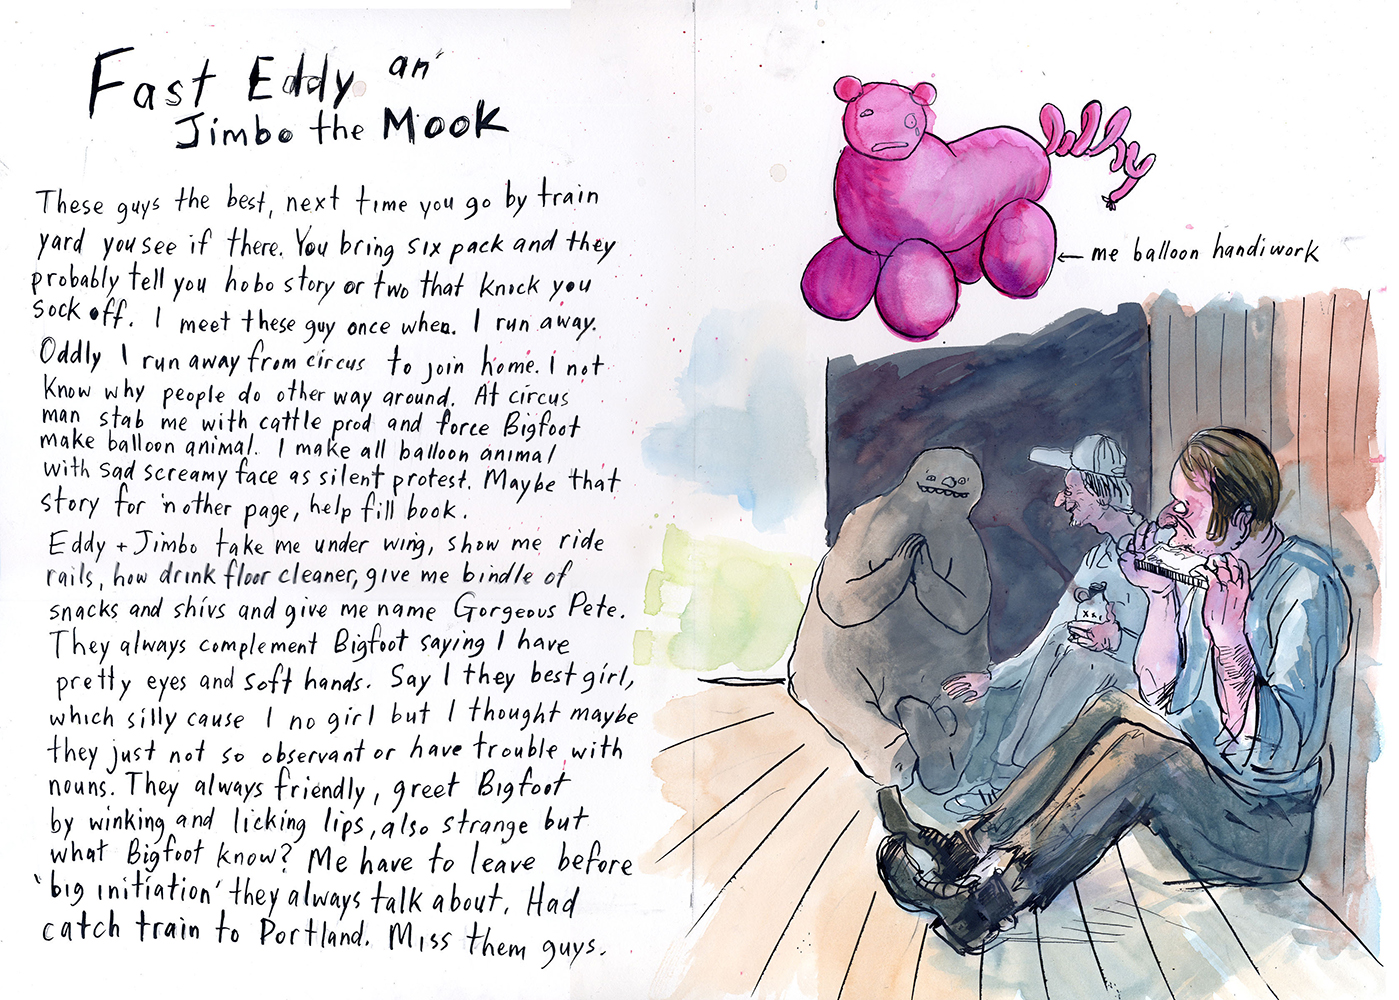 Coupe Magazine Design Awards 2006 - ARTIST: Graham RoumieuTITLE: Me Write Book: It Bigfoot Memoir [3 of 6]CLIENT: Plume Book